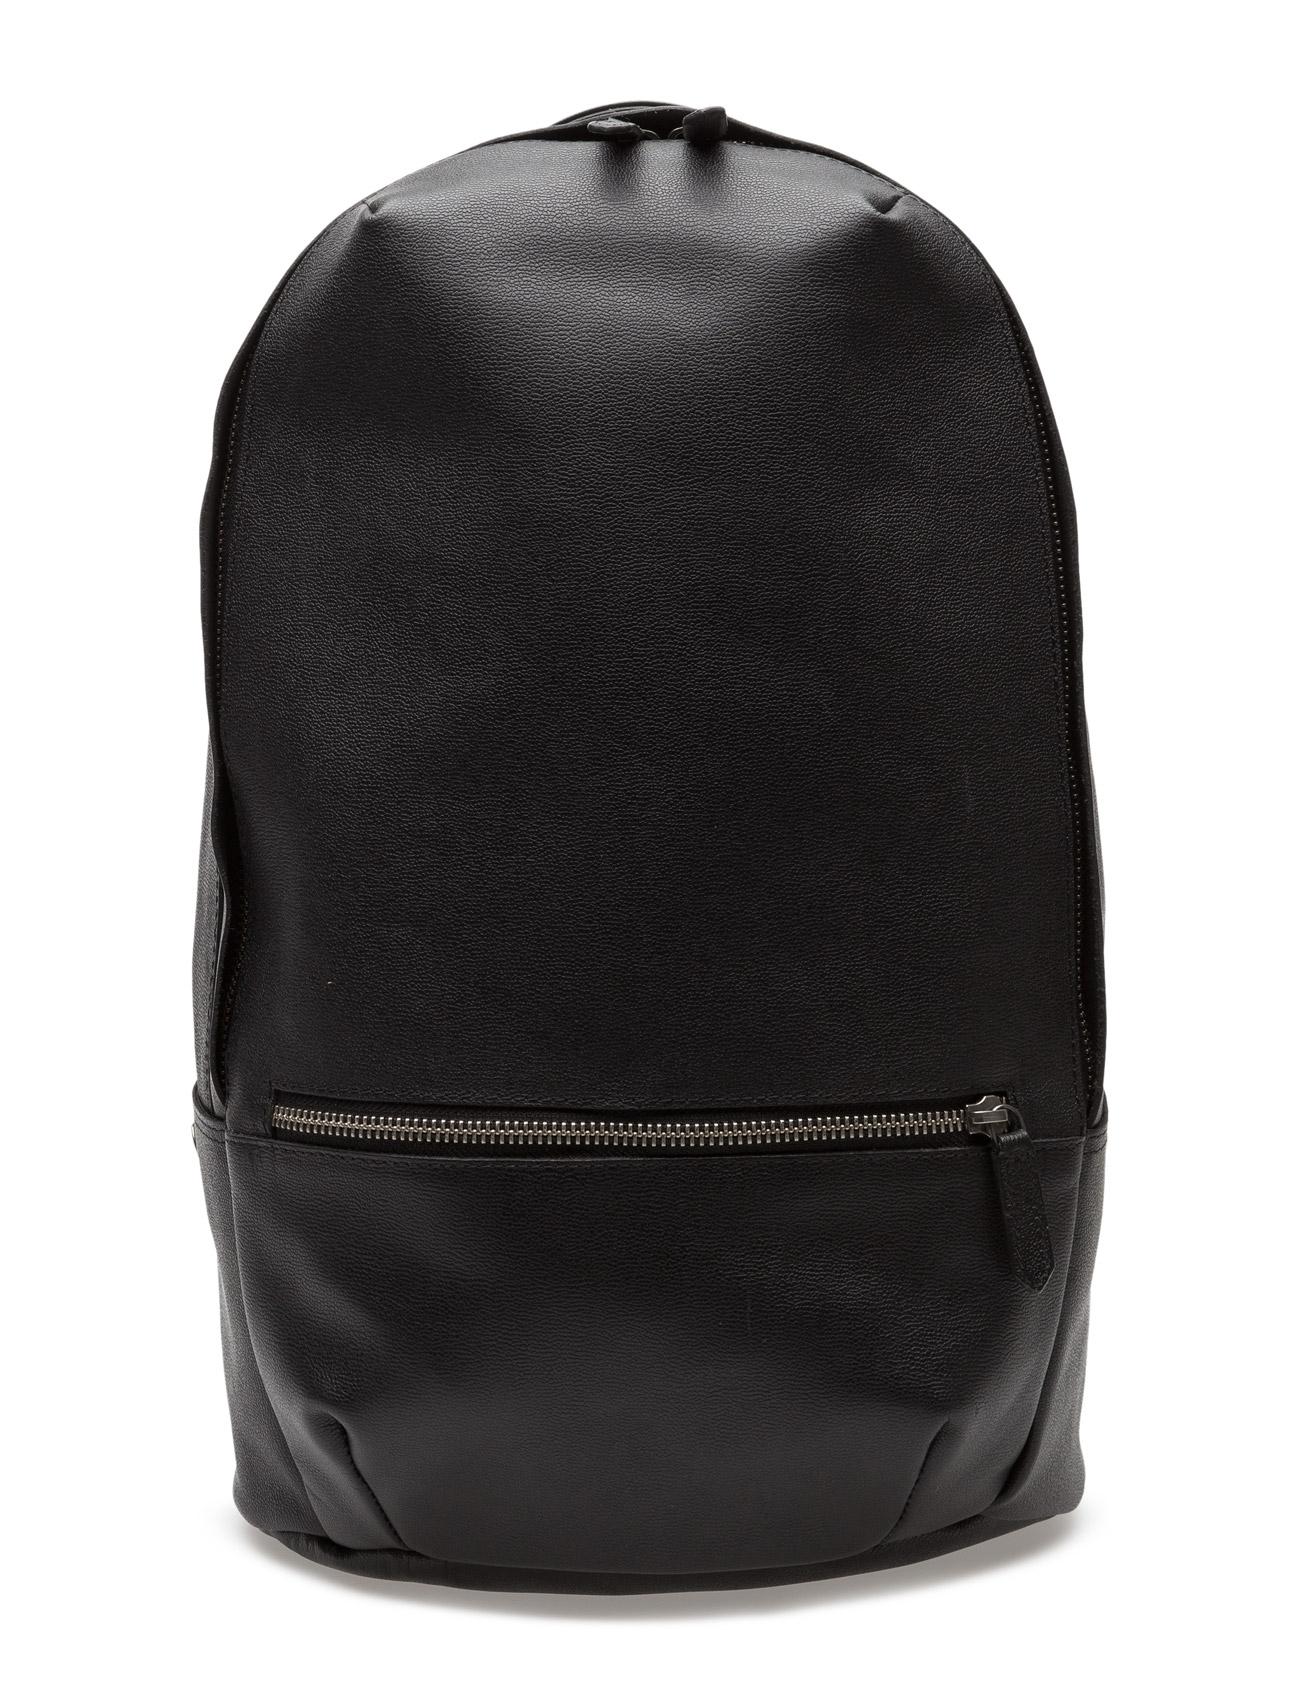 Encore Backpack Mini Royal RepubliQ Rygsække til Herrer i Sort